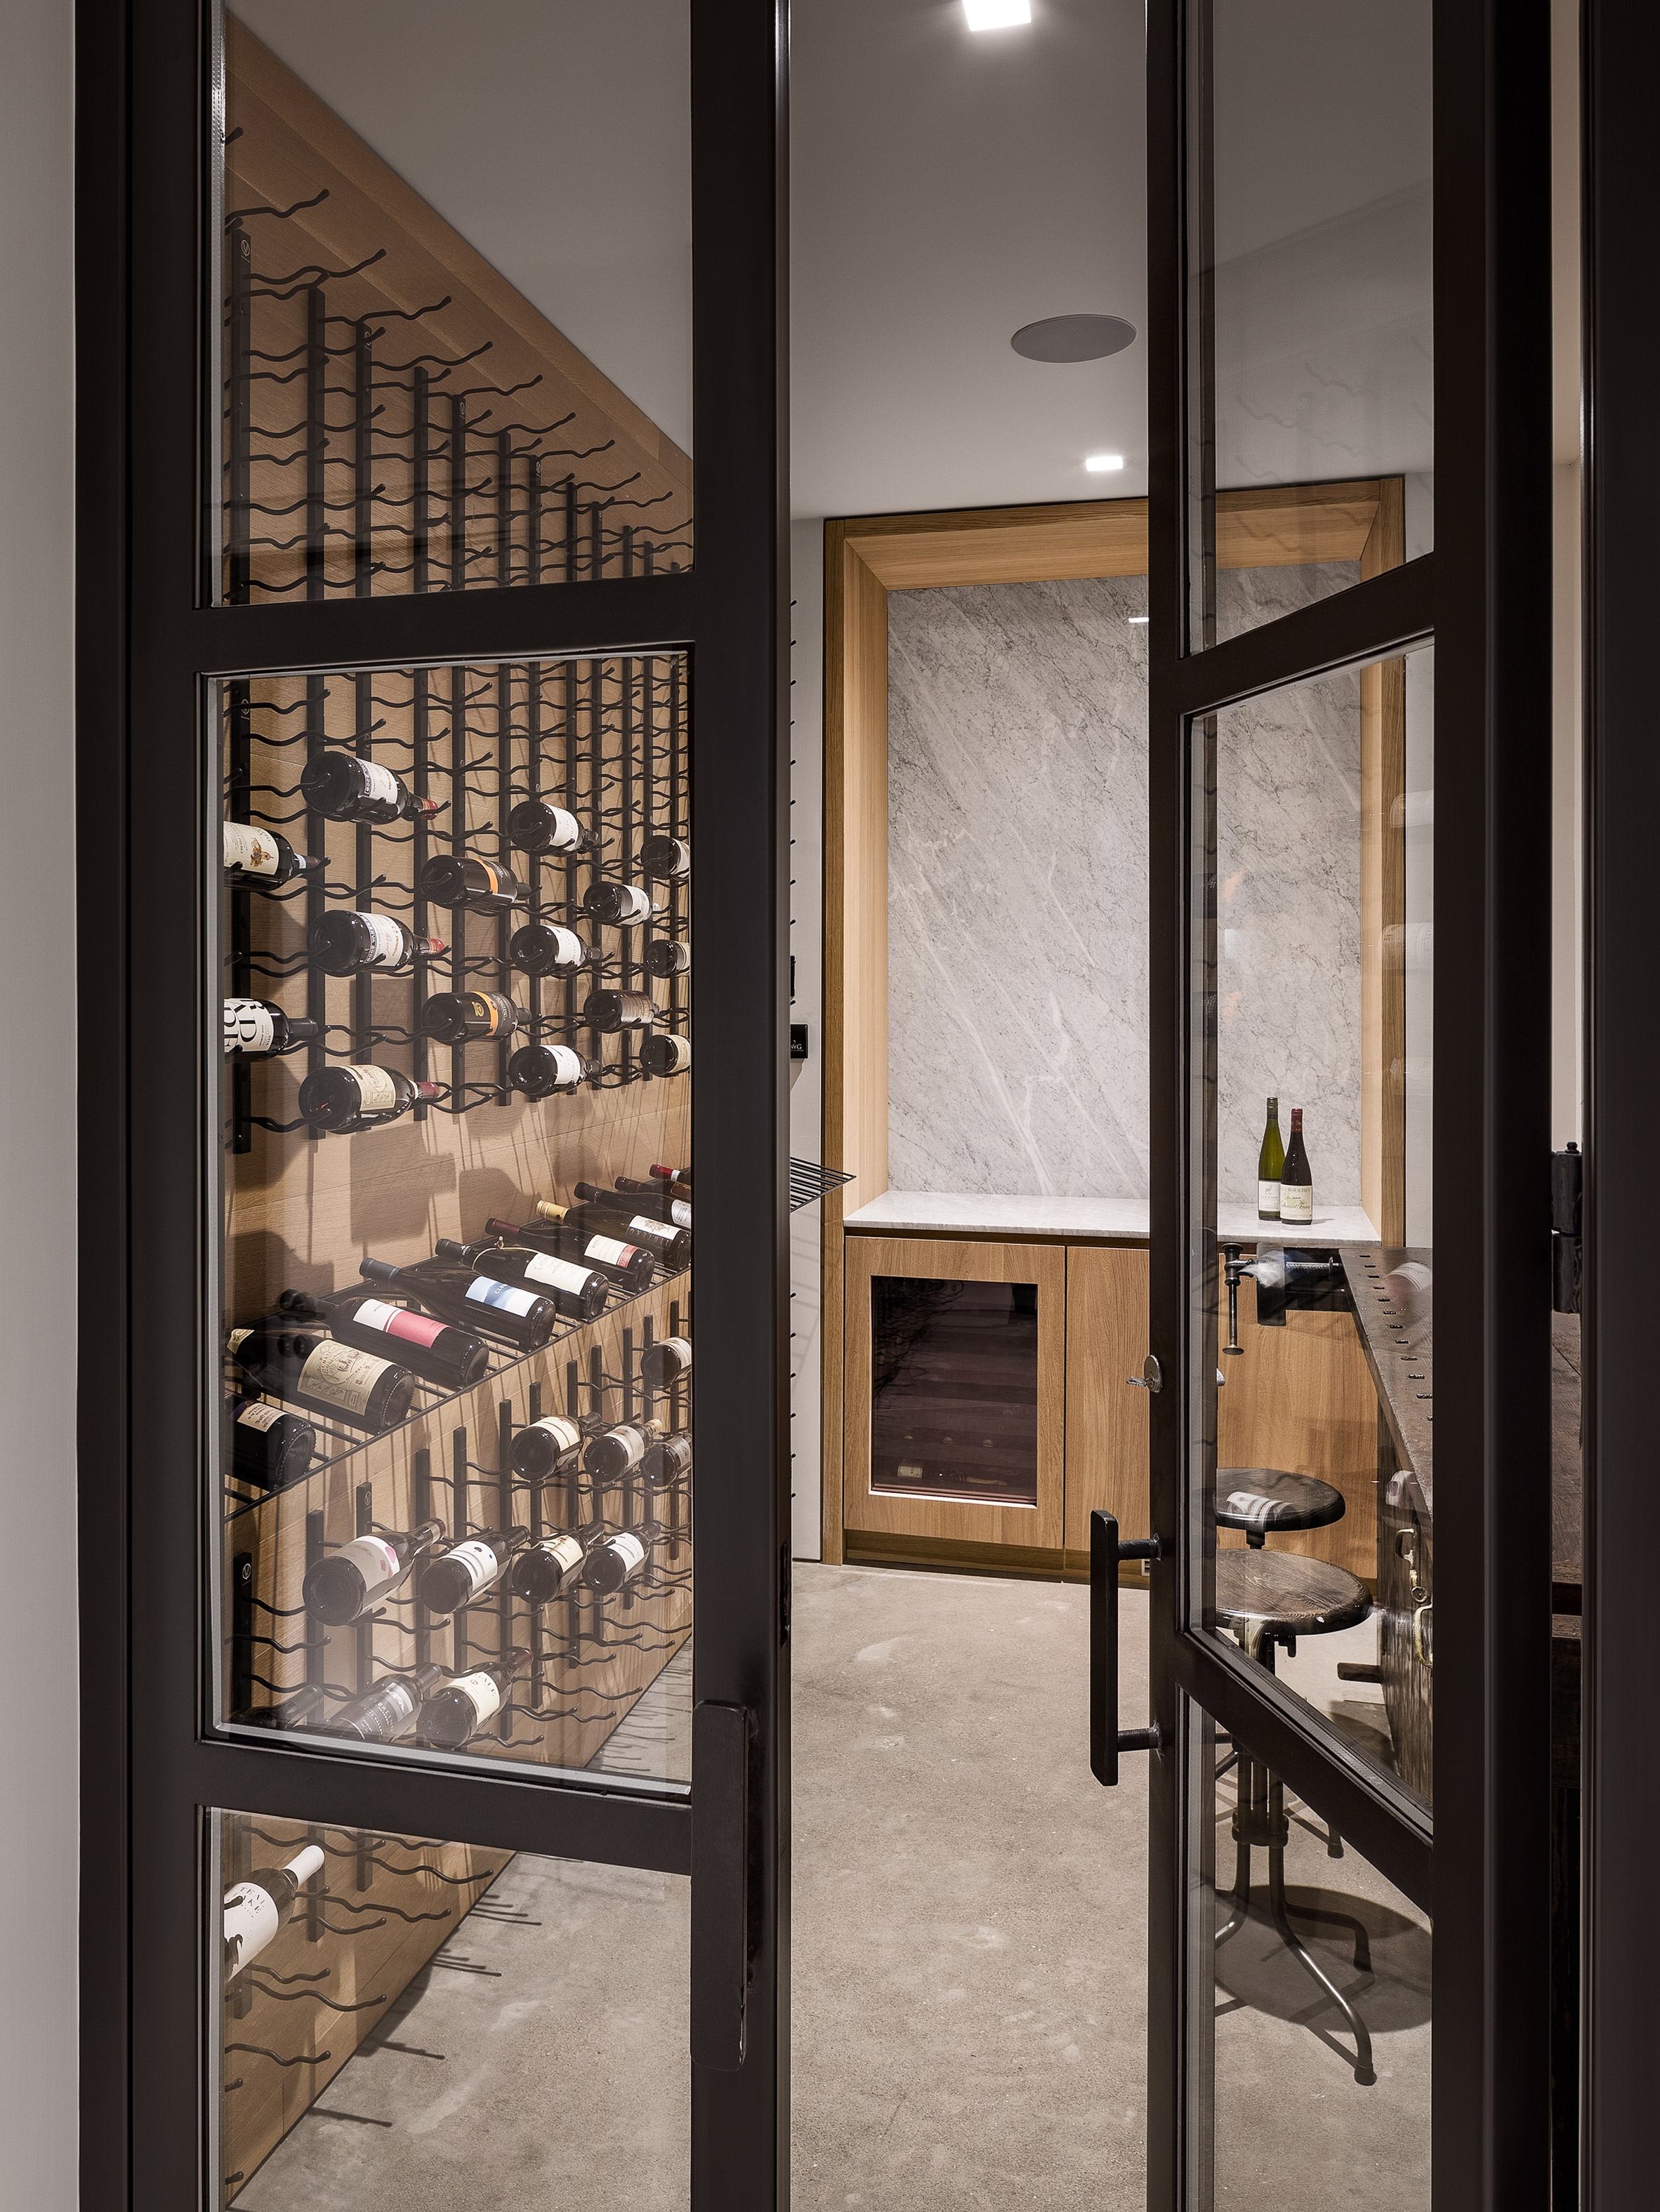 paulus-hook-residence-fogarty-finger-interiors-new-jersey-usa_dezeen_2364_col_19.jpg